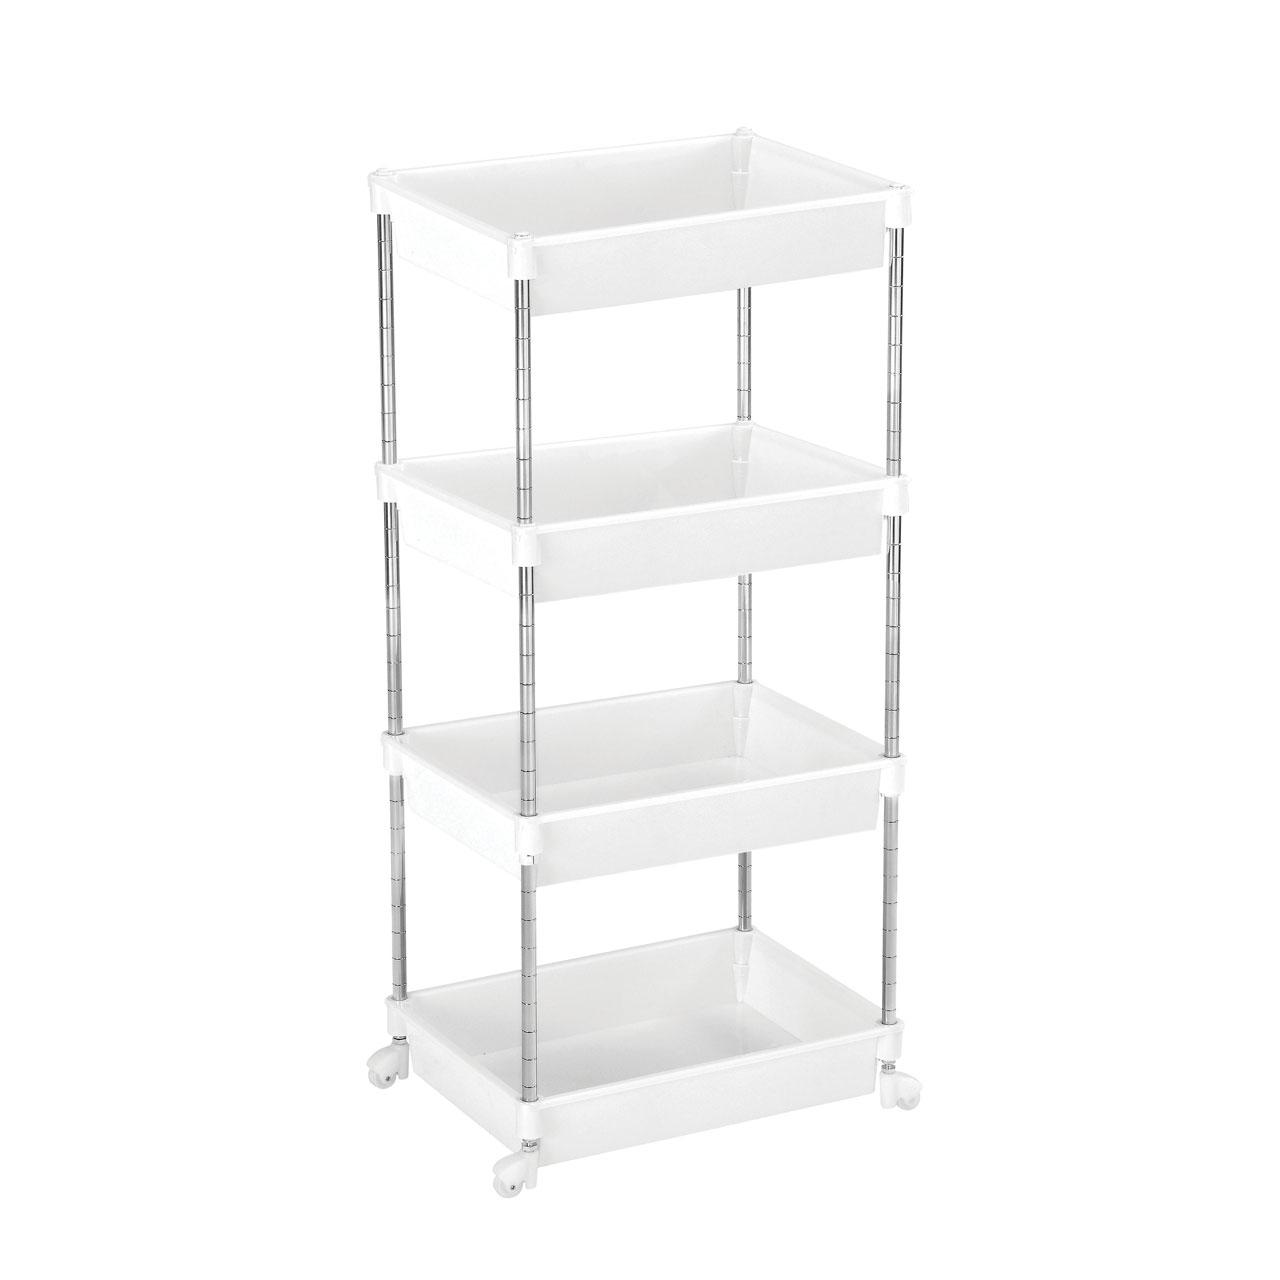 4 Tier White Plastic Shelf Unit Cart Chrome Steel Frame Wheels Bathroom Storage